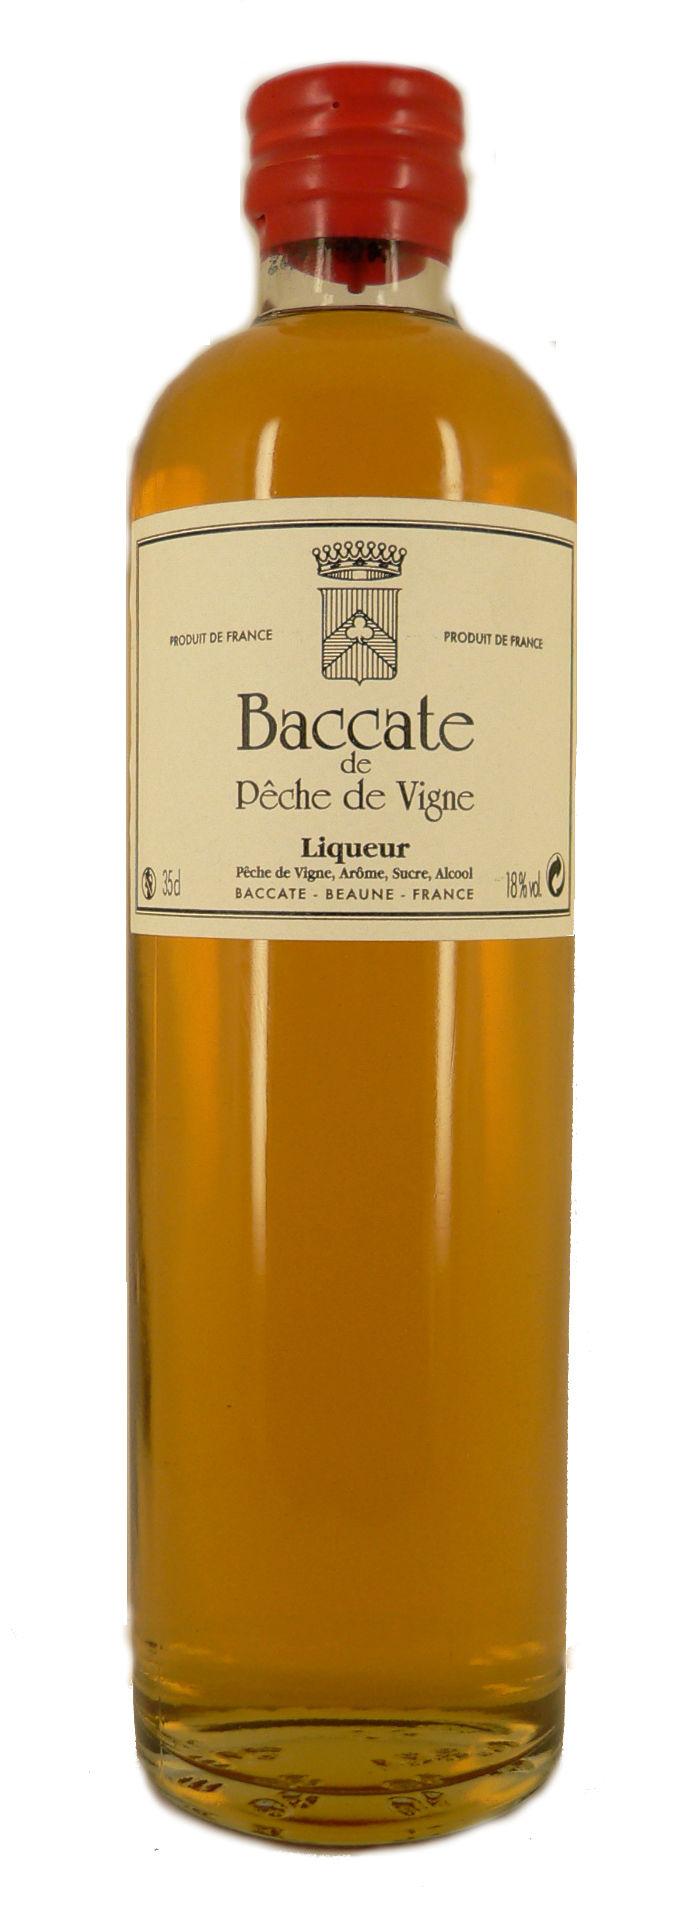 Baccate Peche de Vigne - Pfirsichlikör